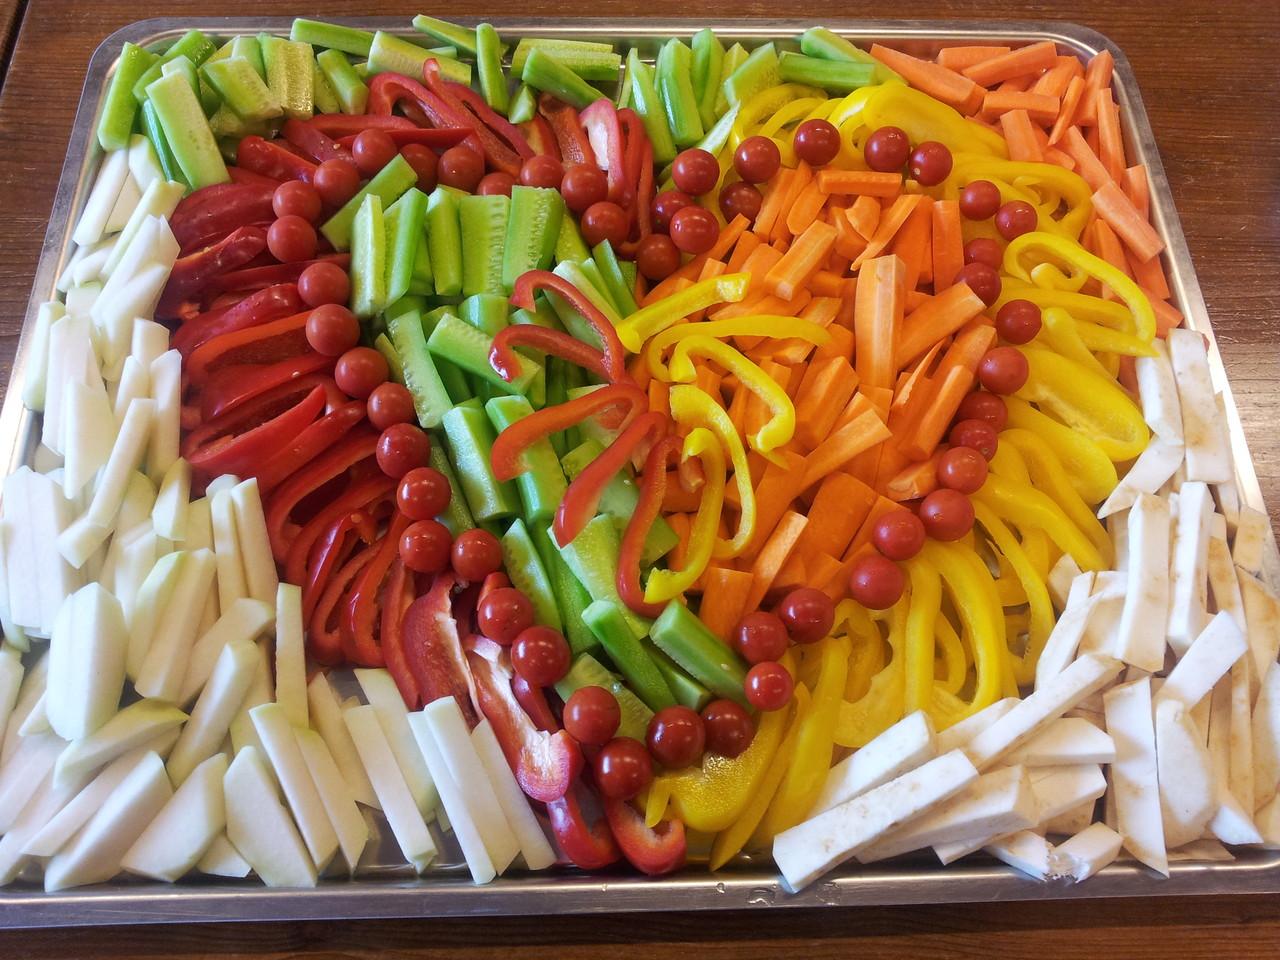 Gemüseplatte pro Person inkl. 2 Dipp Saucen (100 gr.) sFr. 1.90